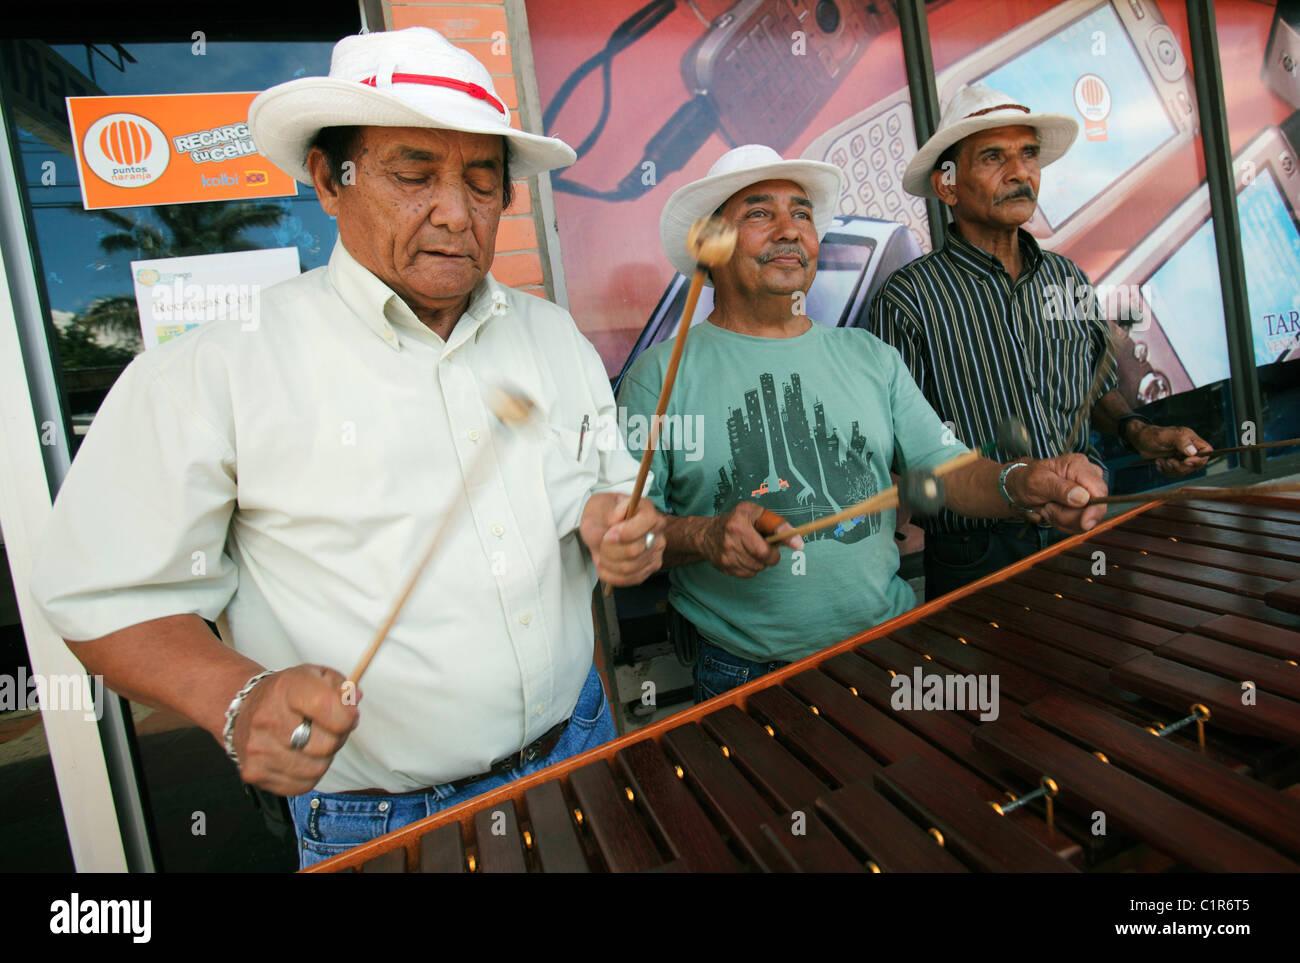 Marimba players, Liberia, Costa Rica - Stock Image